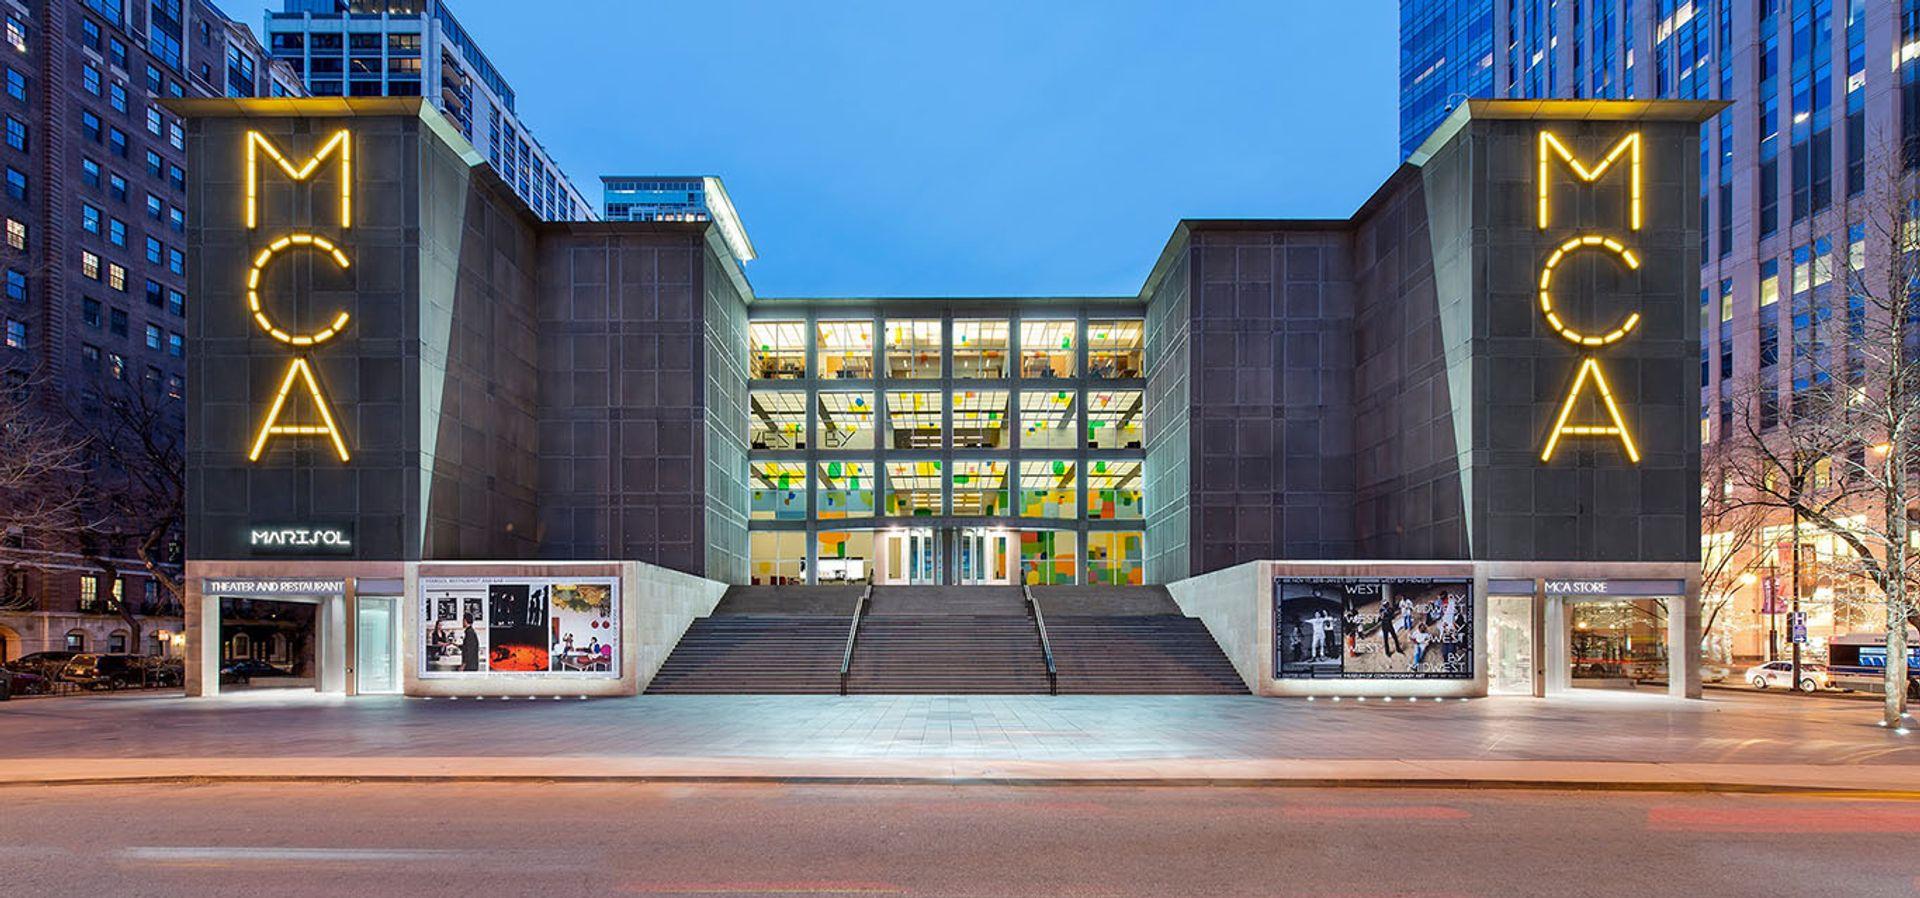 The Museum of Contemporary Art Chicago © Museum of Contemporary Art Chicago